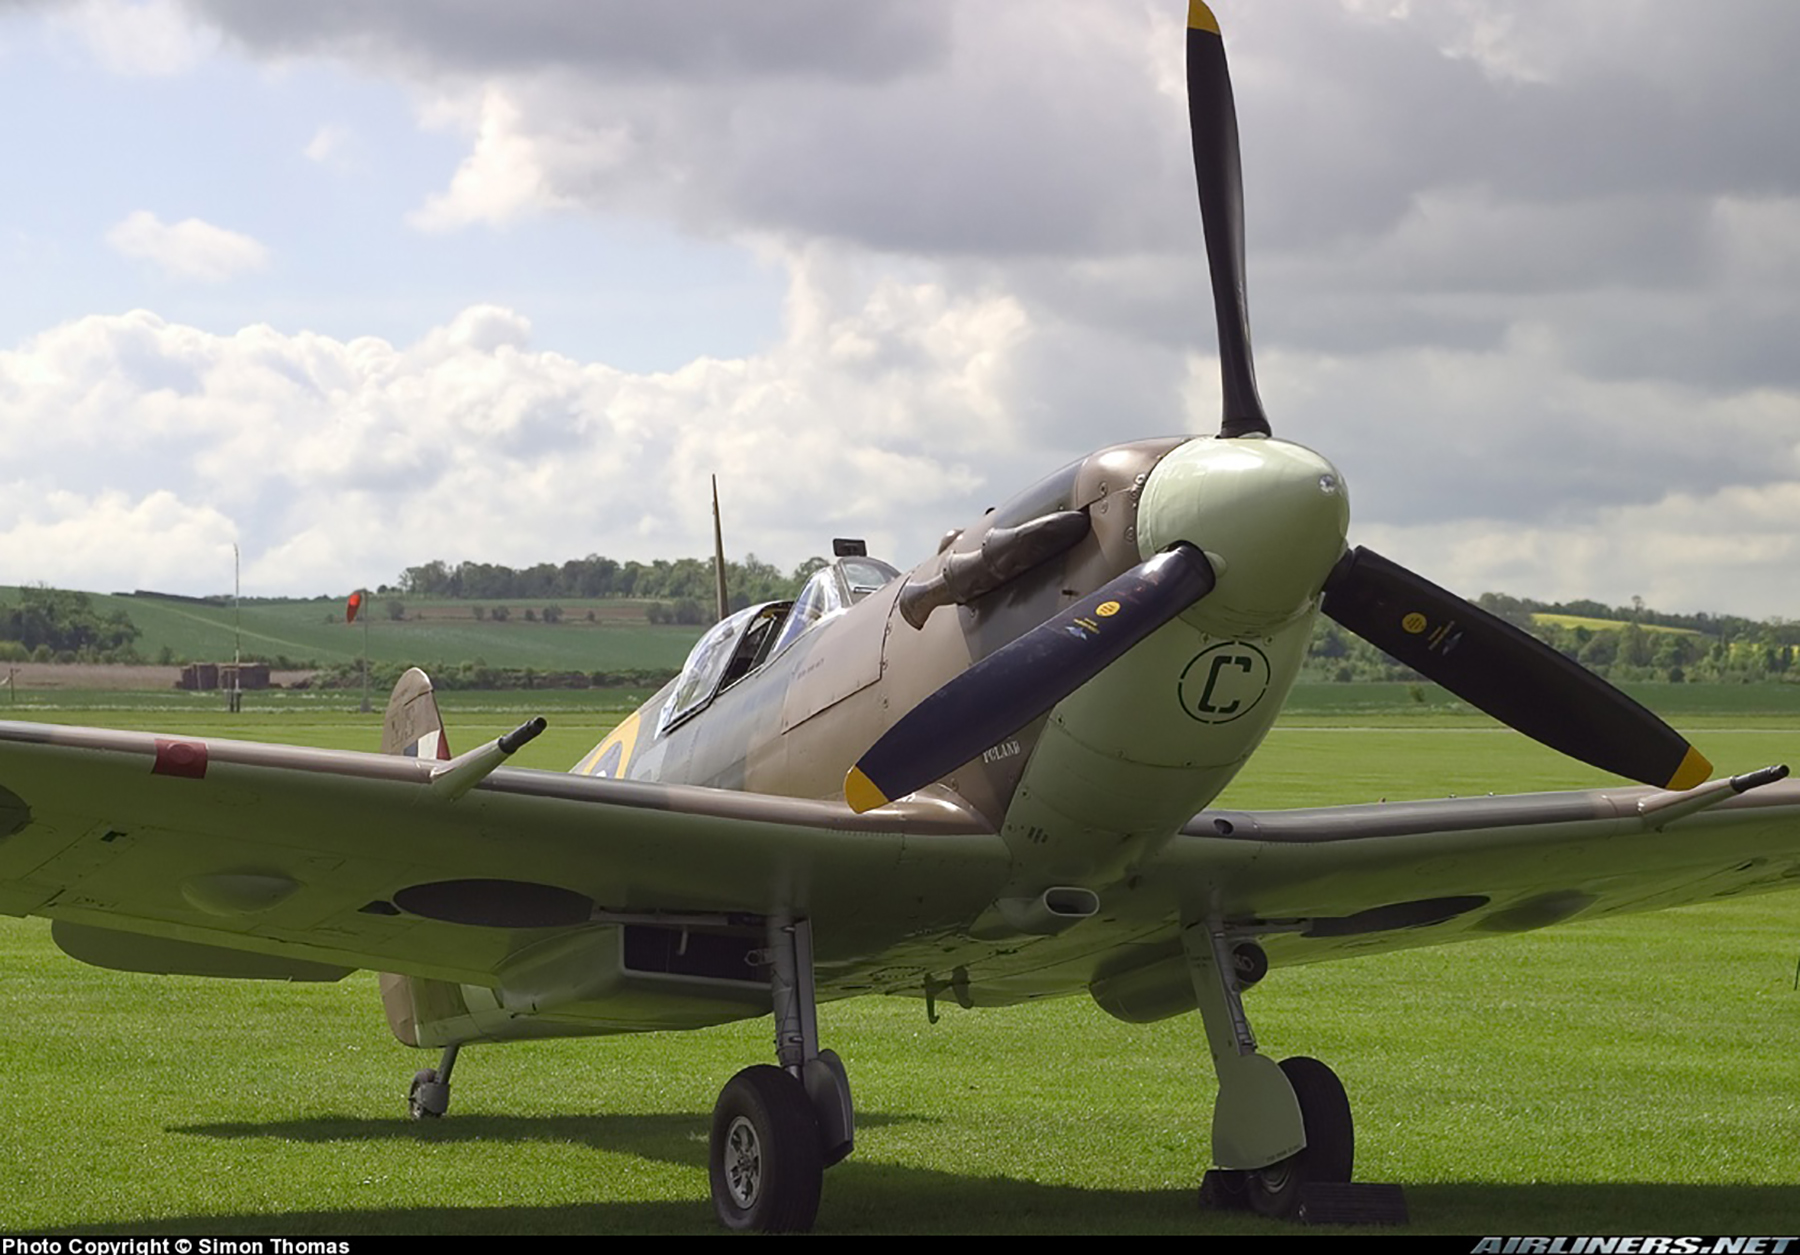 Airworthy Spitfire warbird MkVb RAF 317Sqn JHC BM597 G MKVB 22